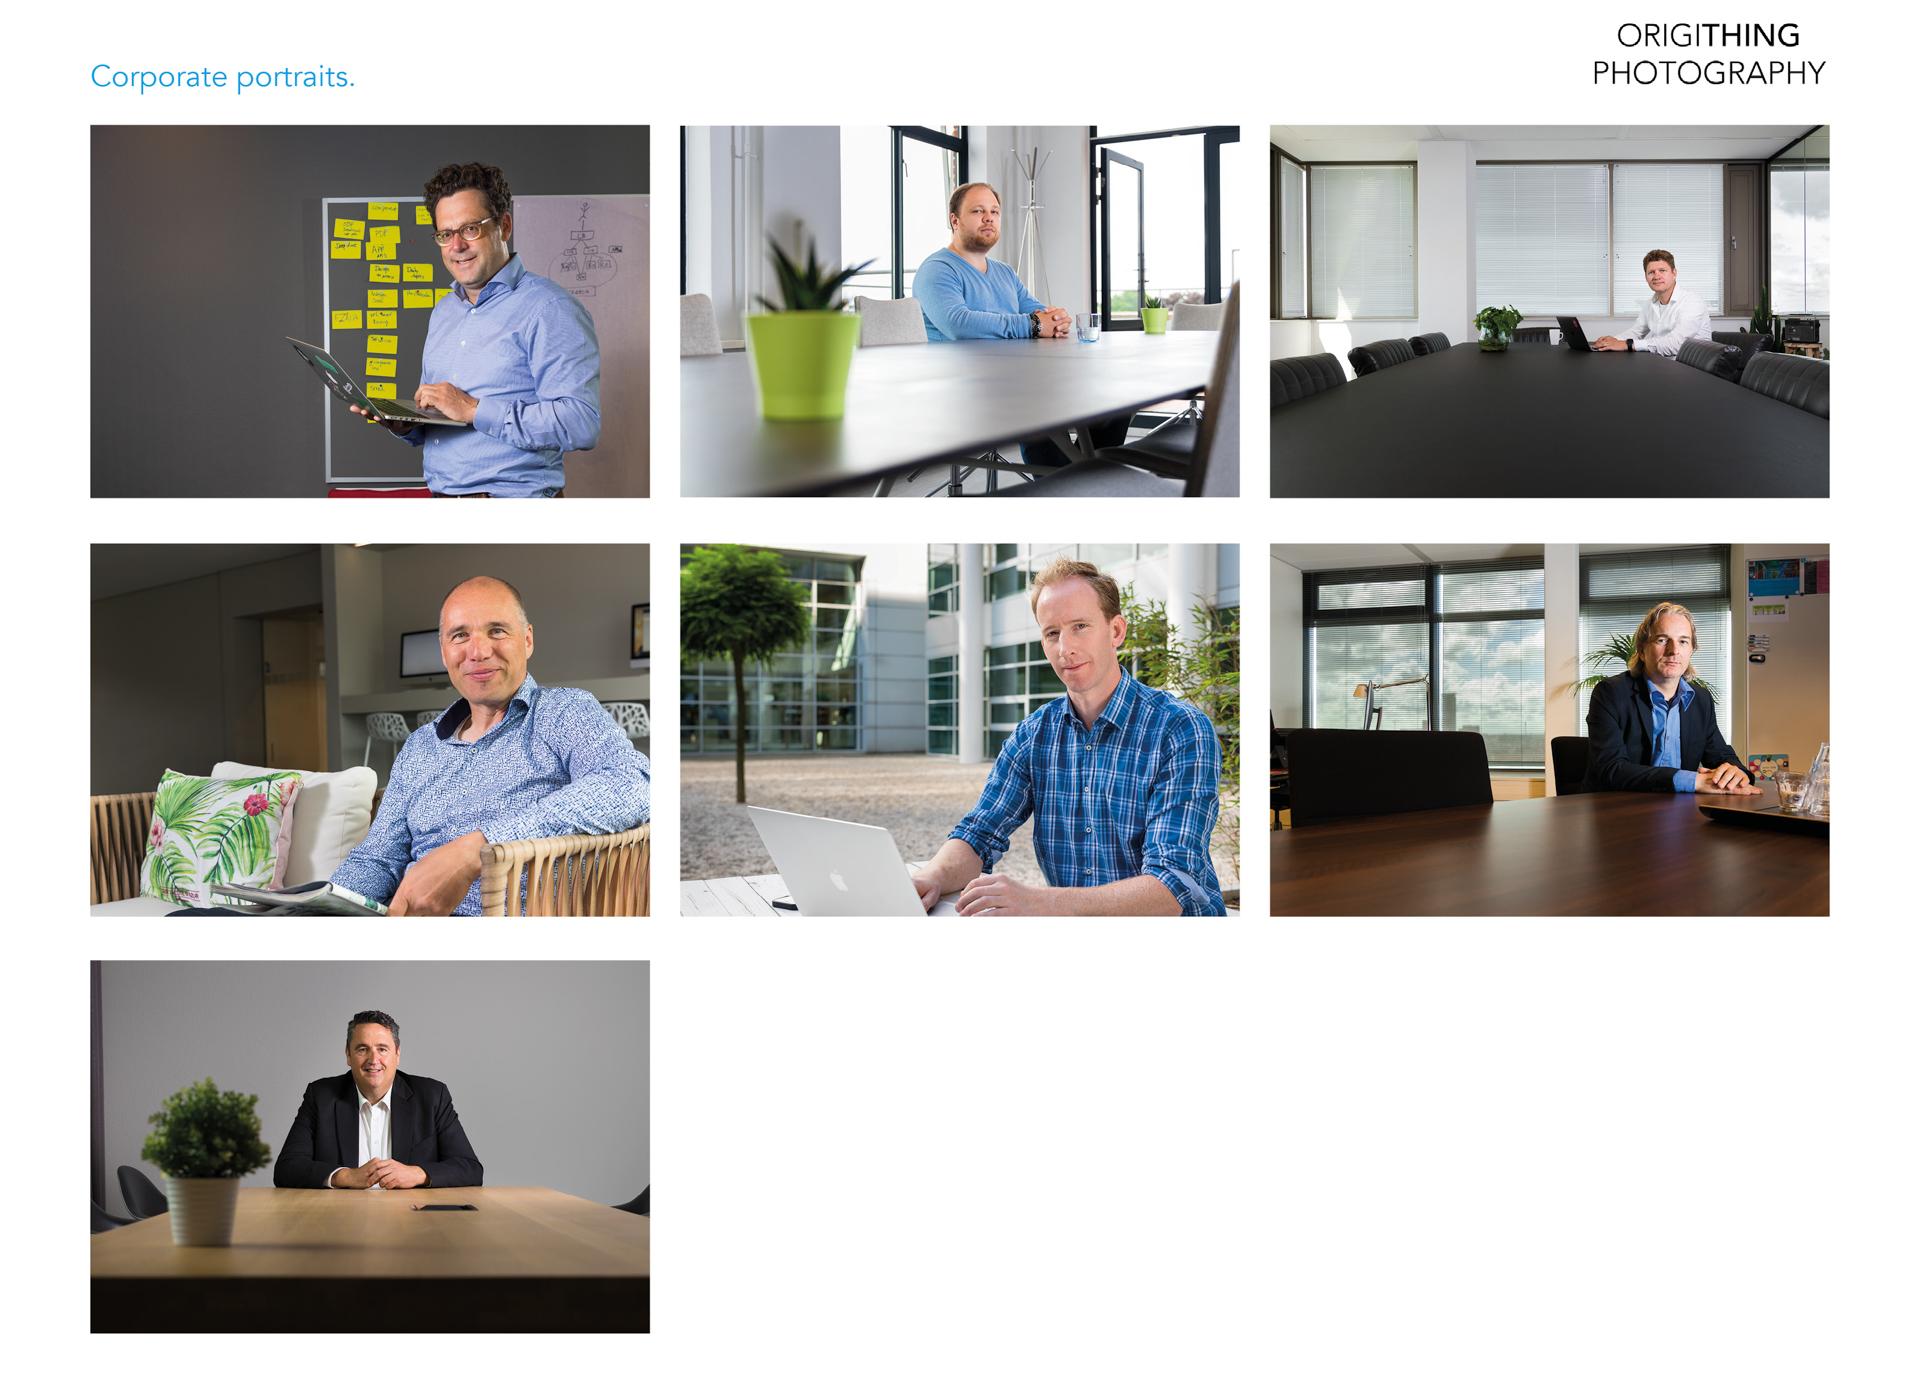 Corporate-portraiture_1.jpg